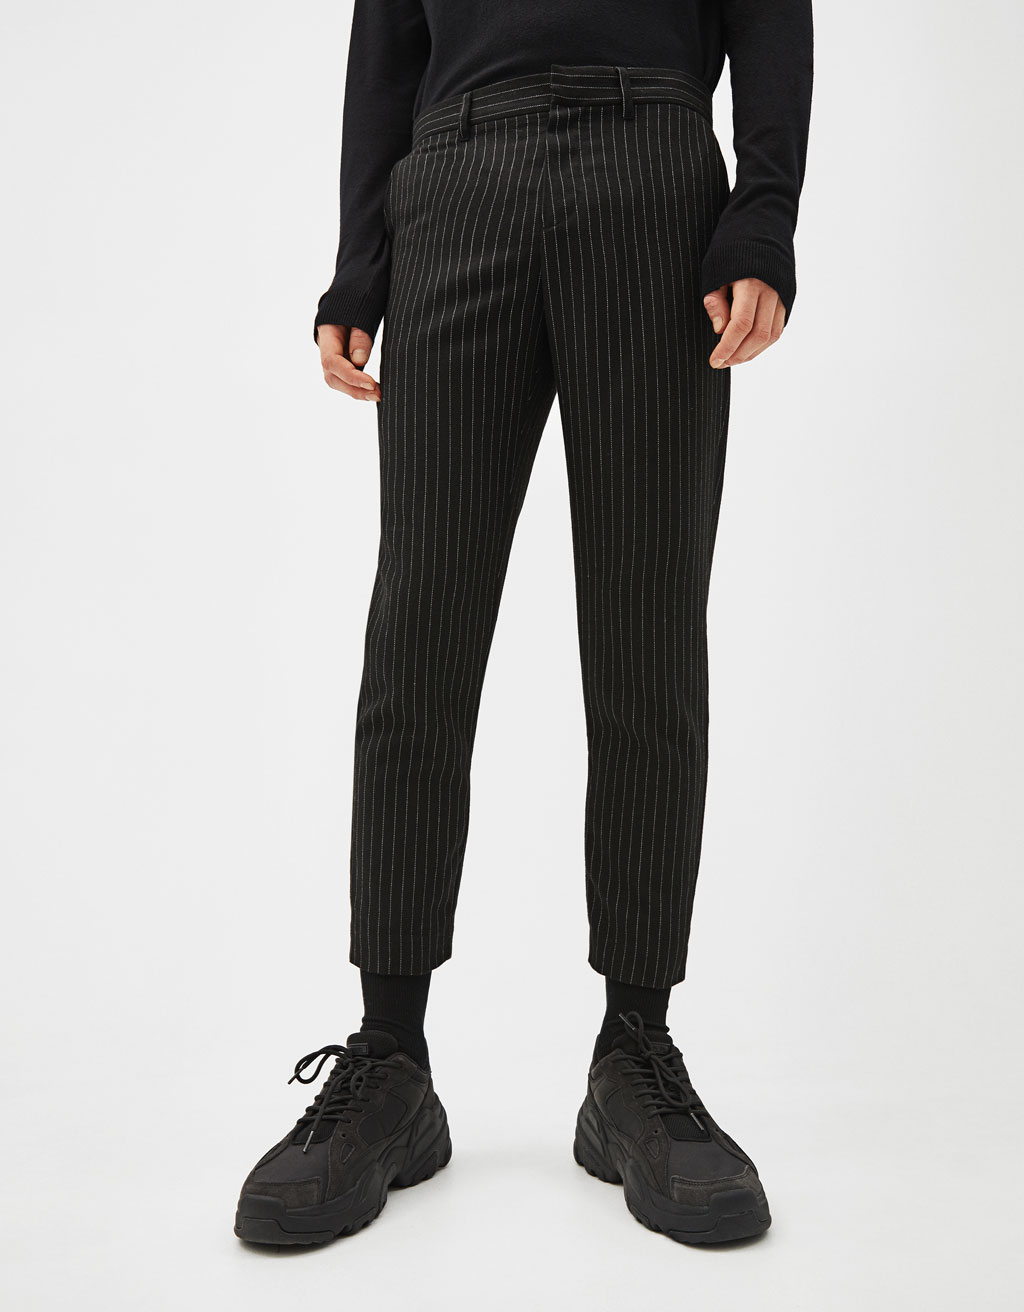 Spodnie Tailoring by Bershka